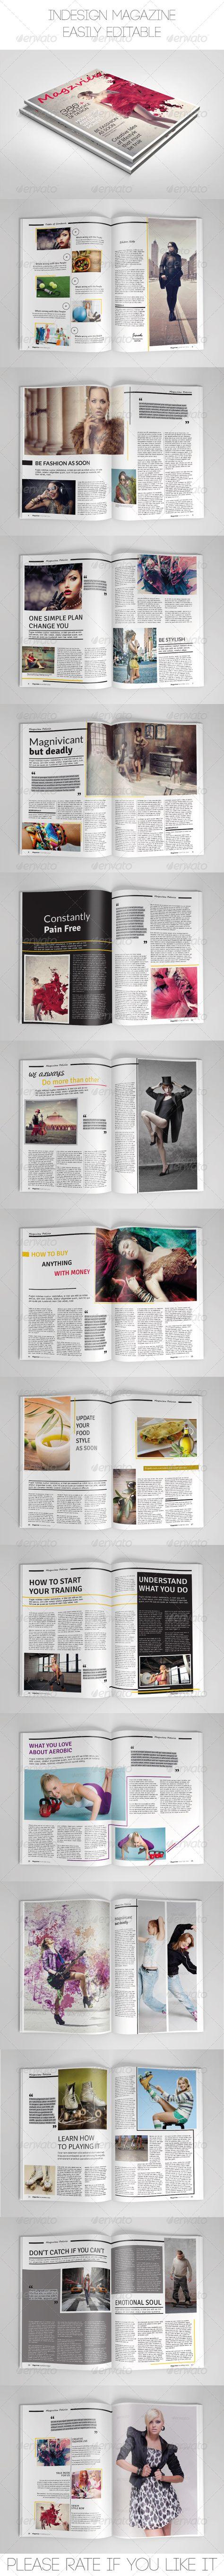 A4A5 Landscape Magazine Template A5